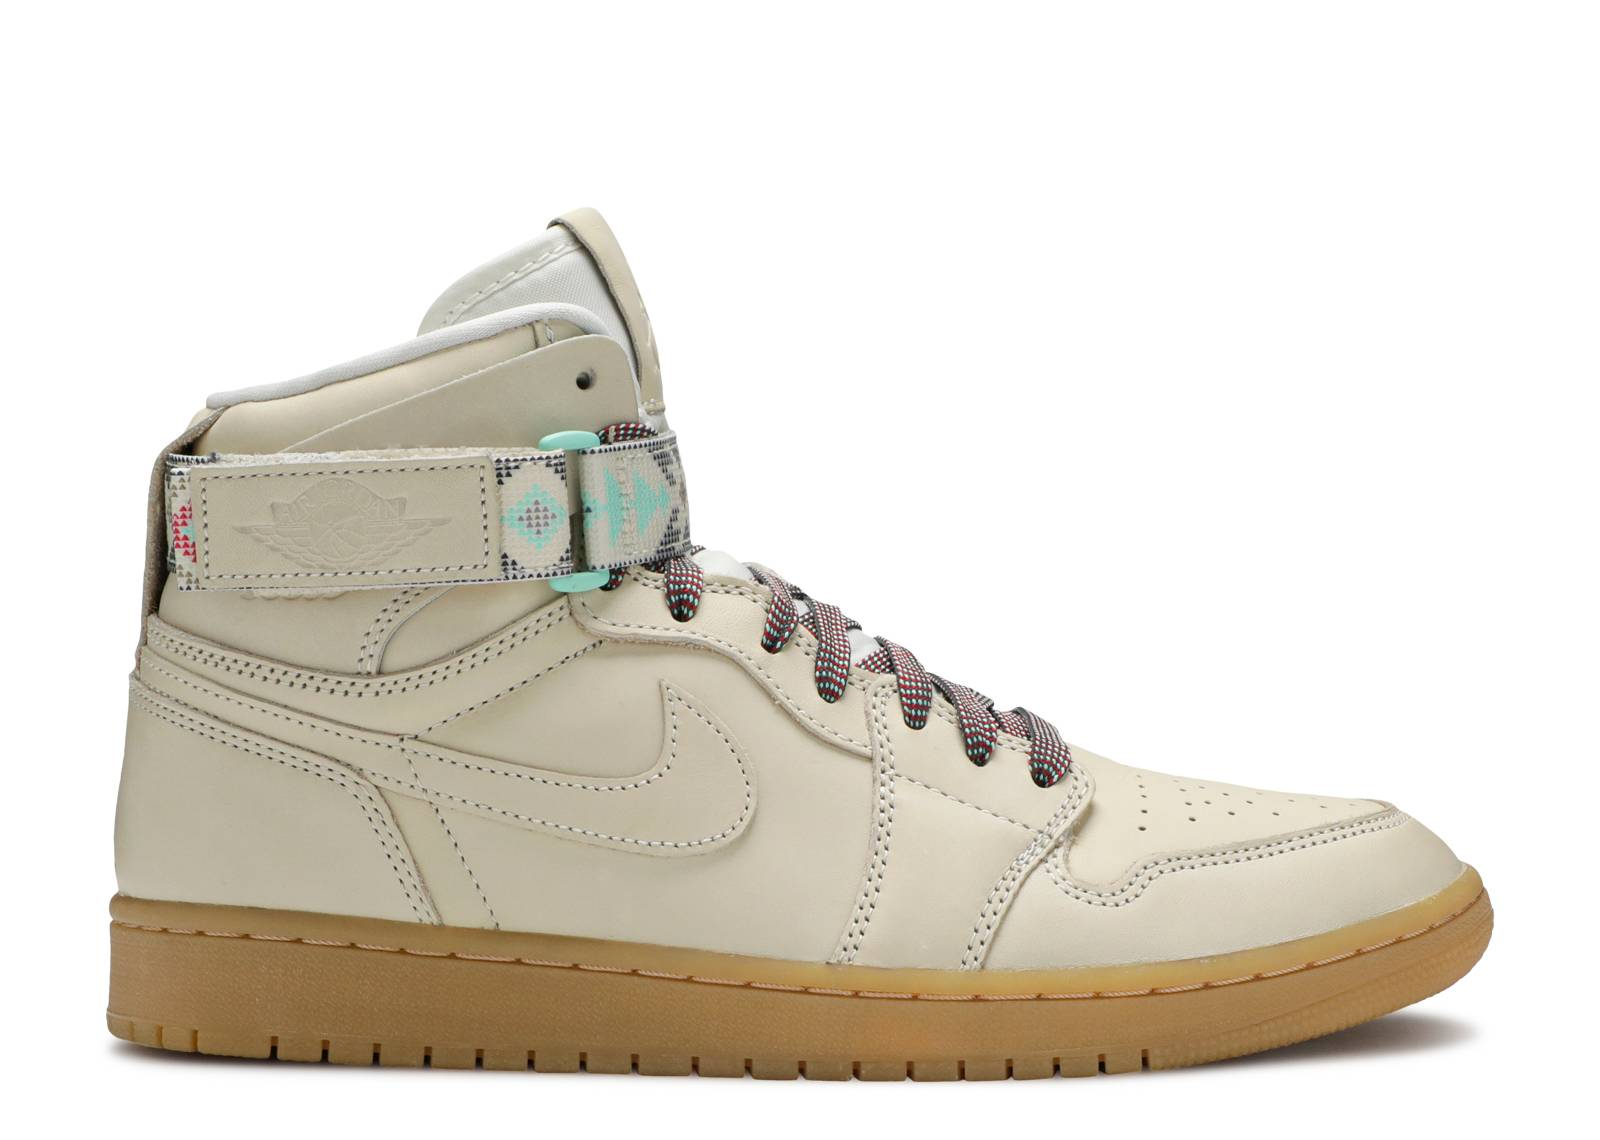 495505c70f6 Air Jordan 1 Retro Hi Strap